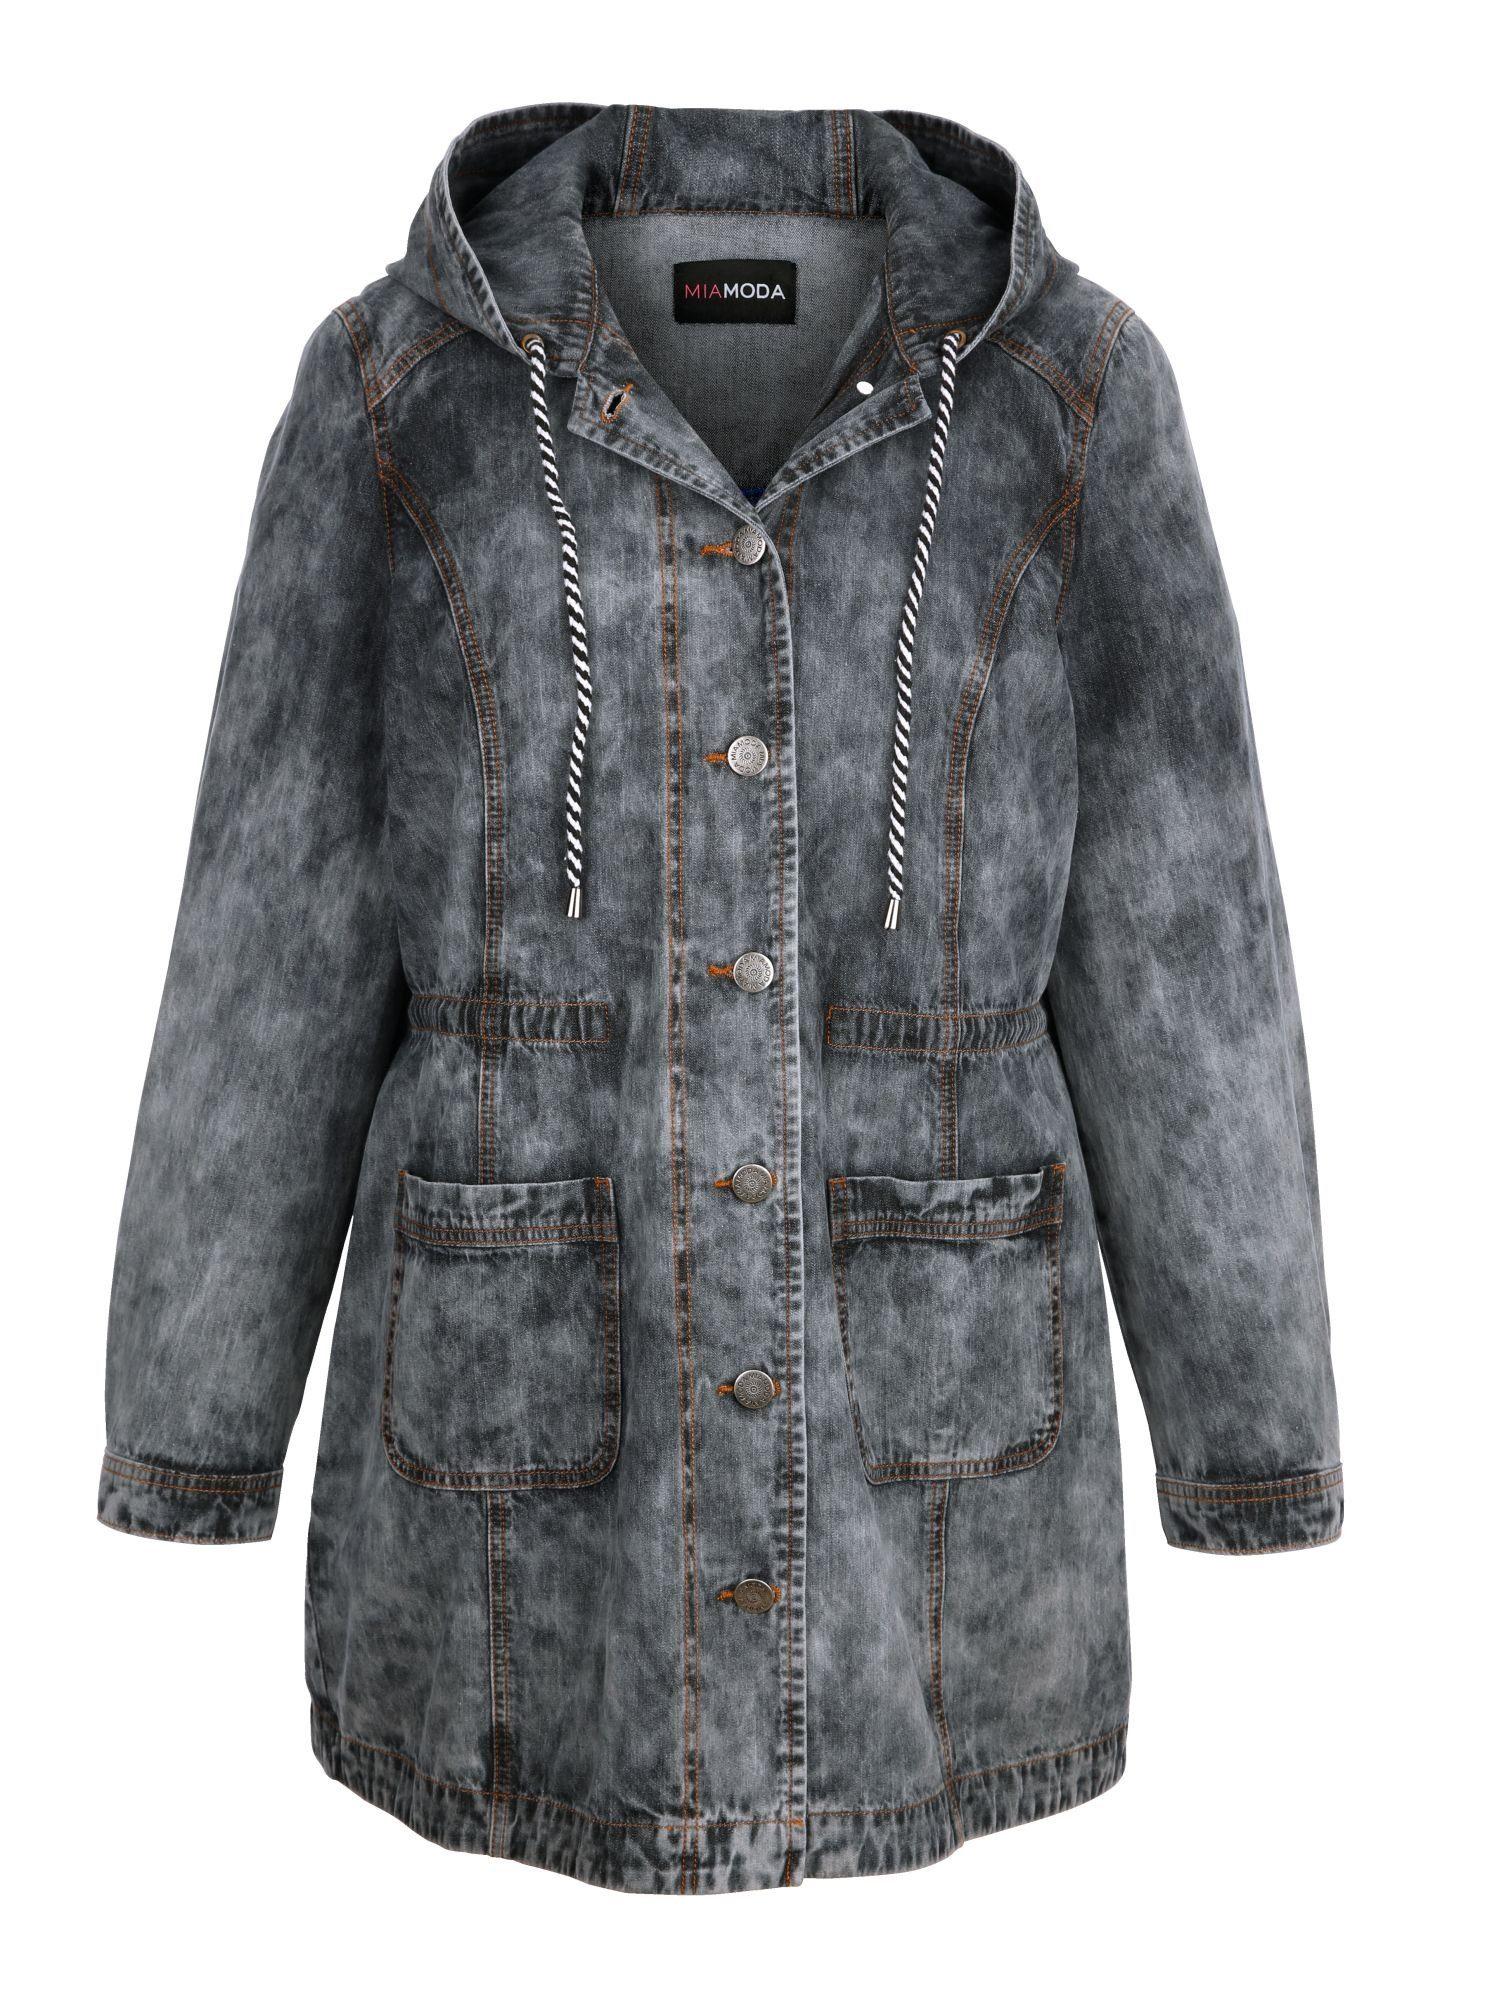 MIAMODA Jeansjacke im modischen Parka-Style